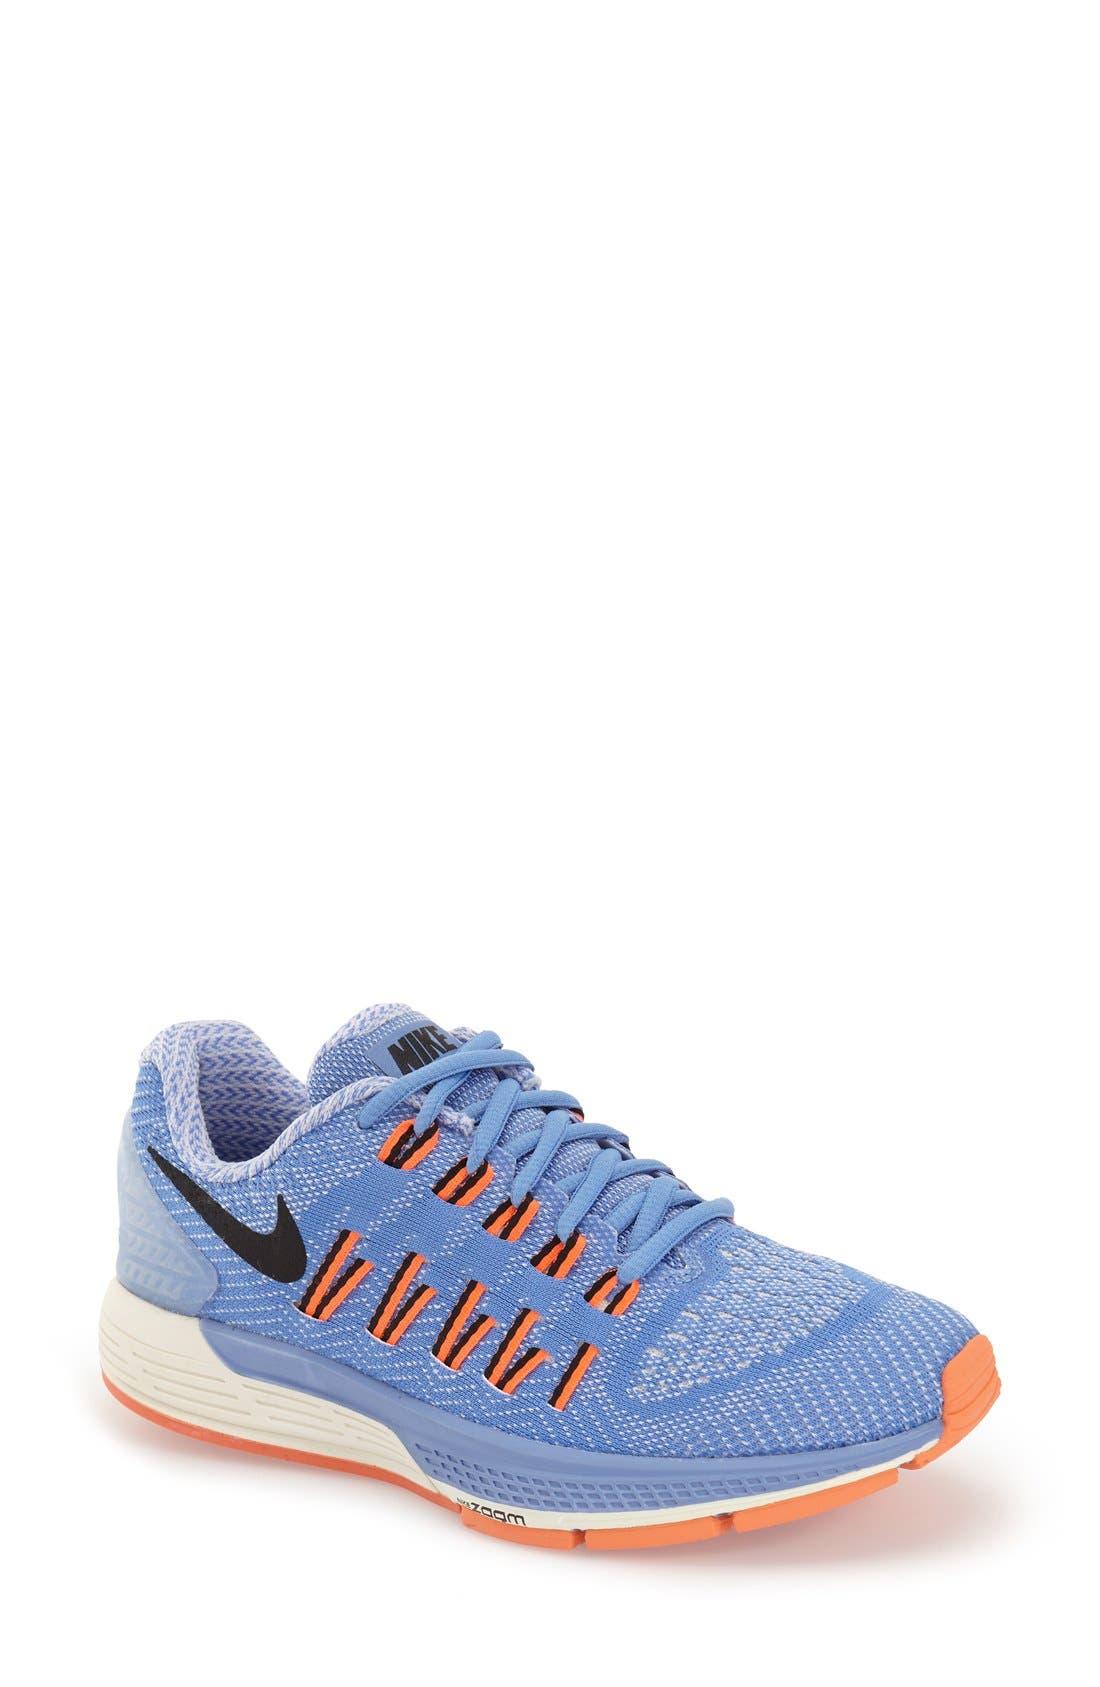 Alternate Image 1 Selected - Nike 'Air Zoom Odyssey' Running Shoe (Women)